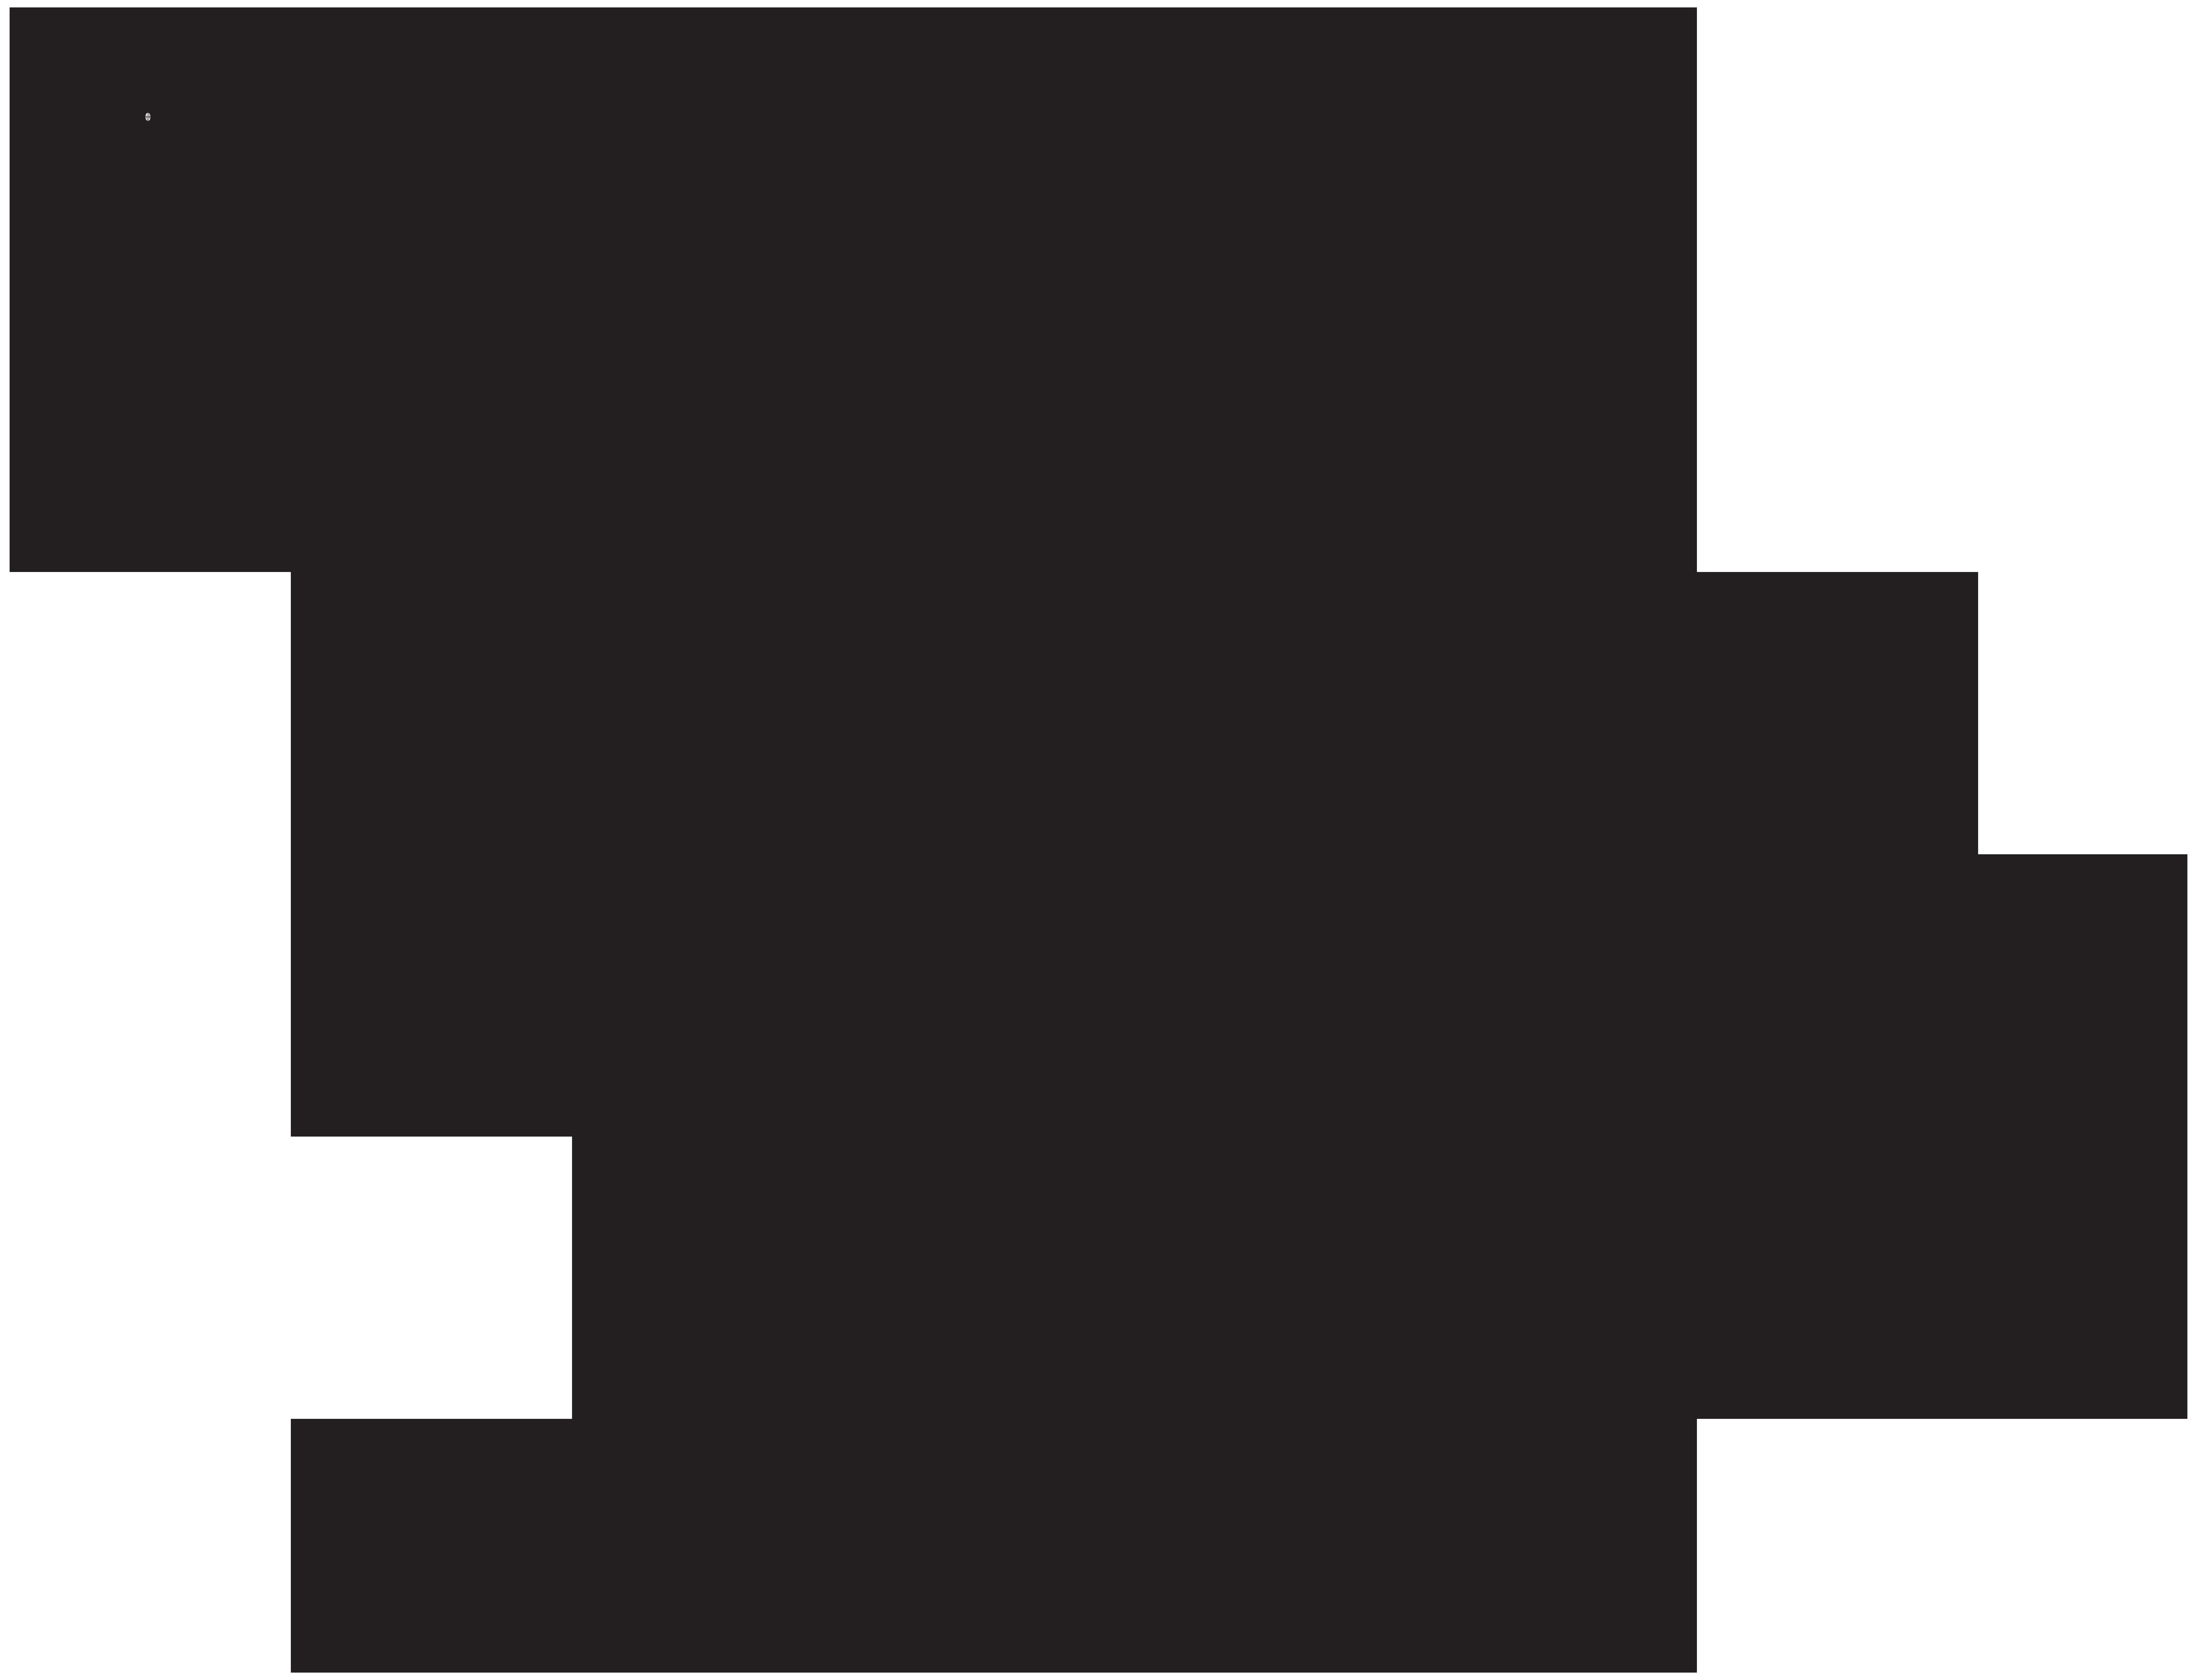 Head clipart cheetah. Silhouette png transparent clip